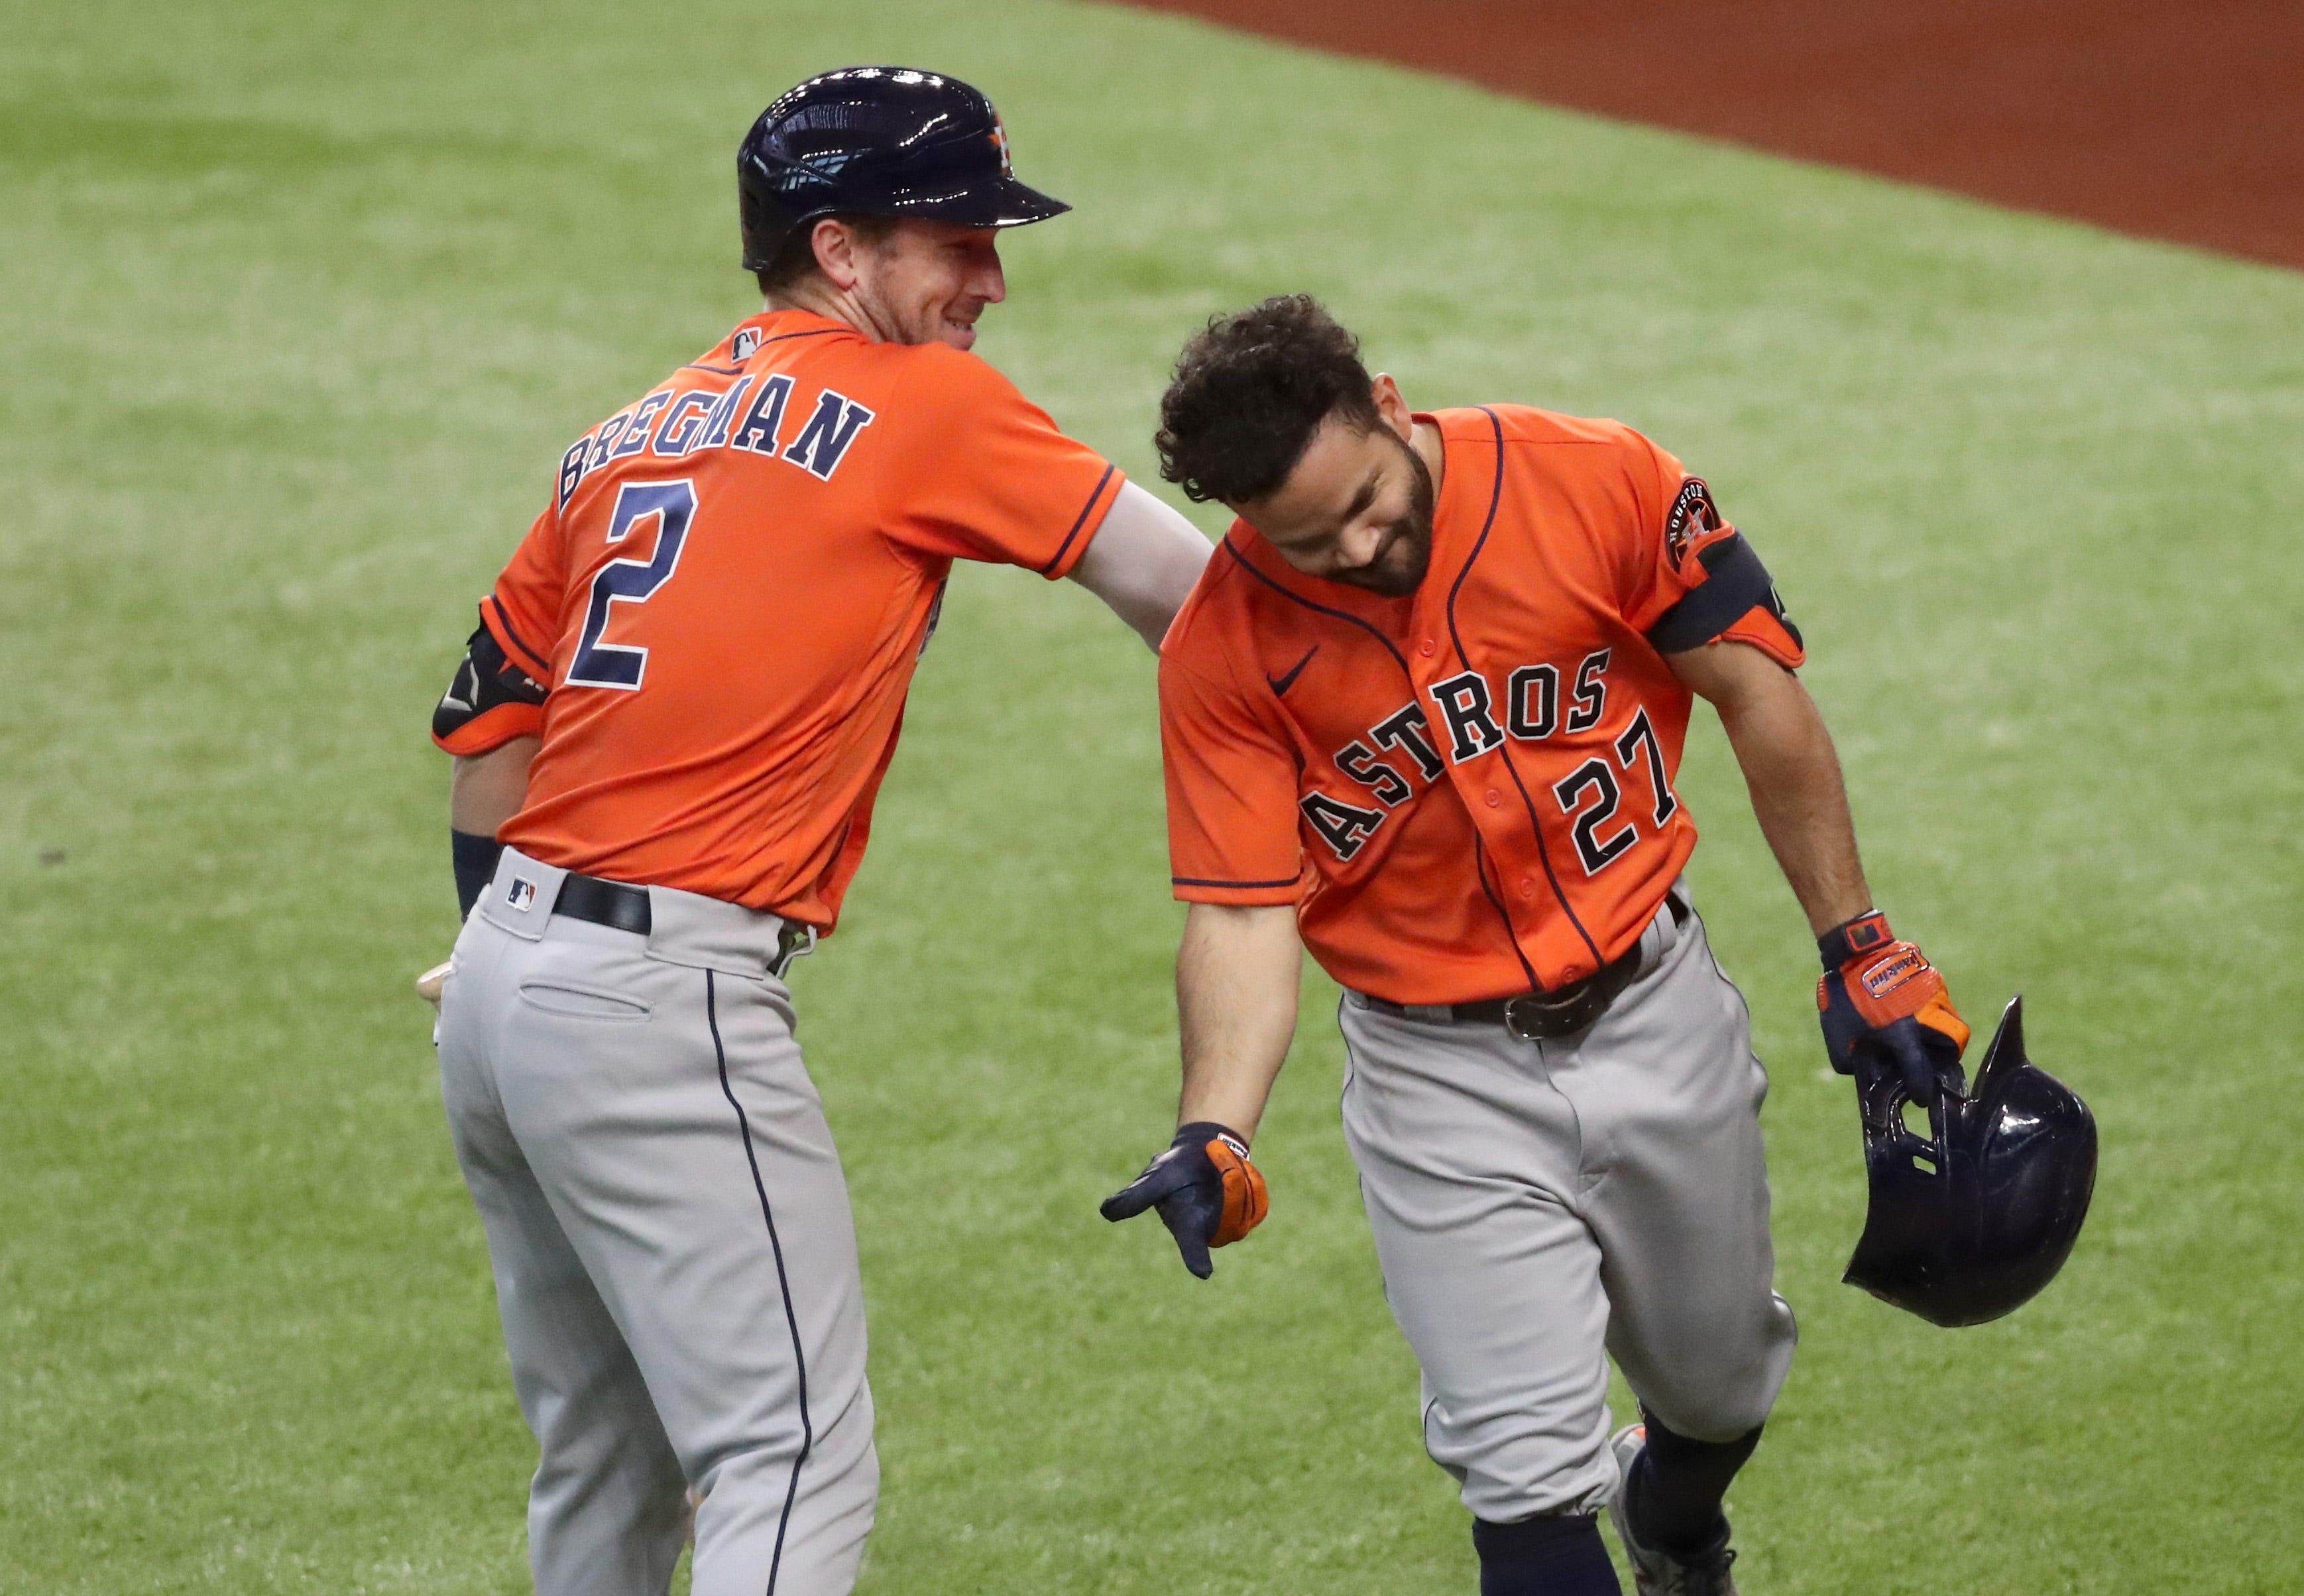 MLB playoffs live updates: Twins-Astros kicks off American League Wild Card series